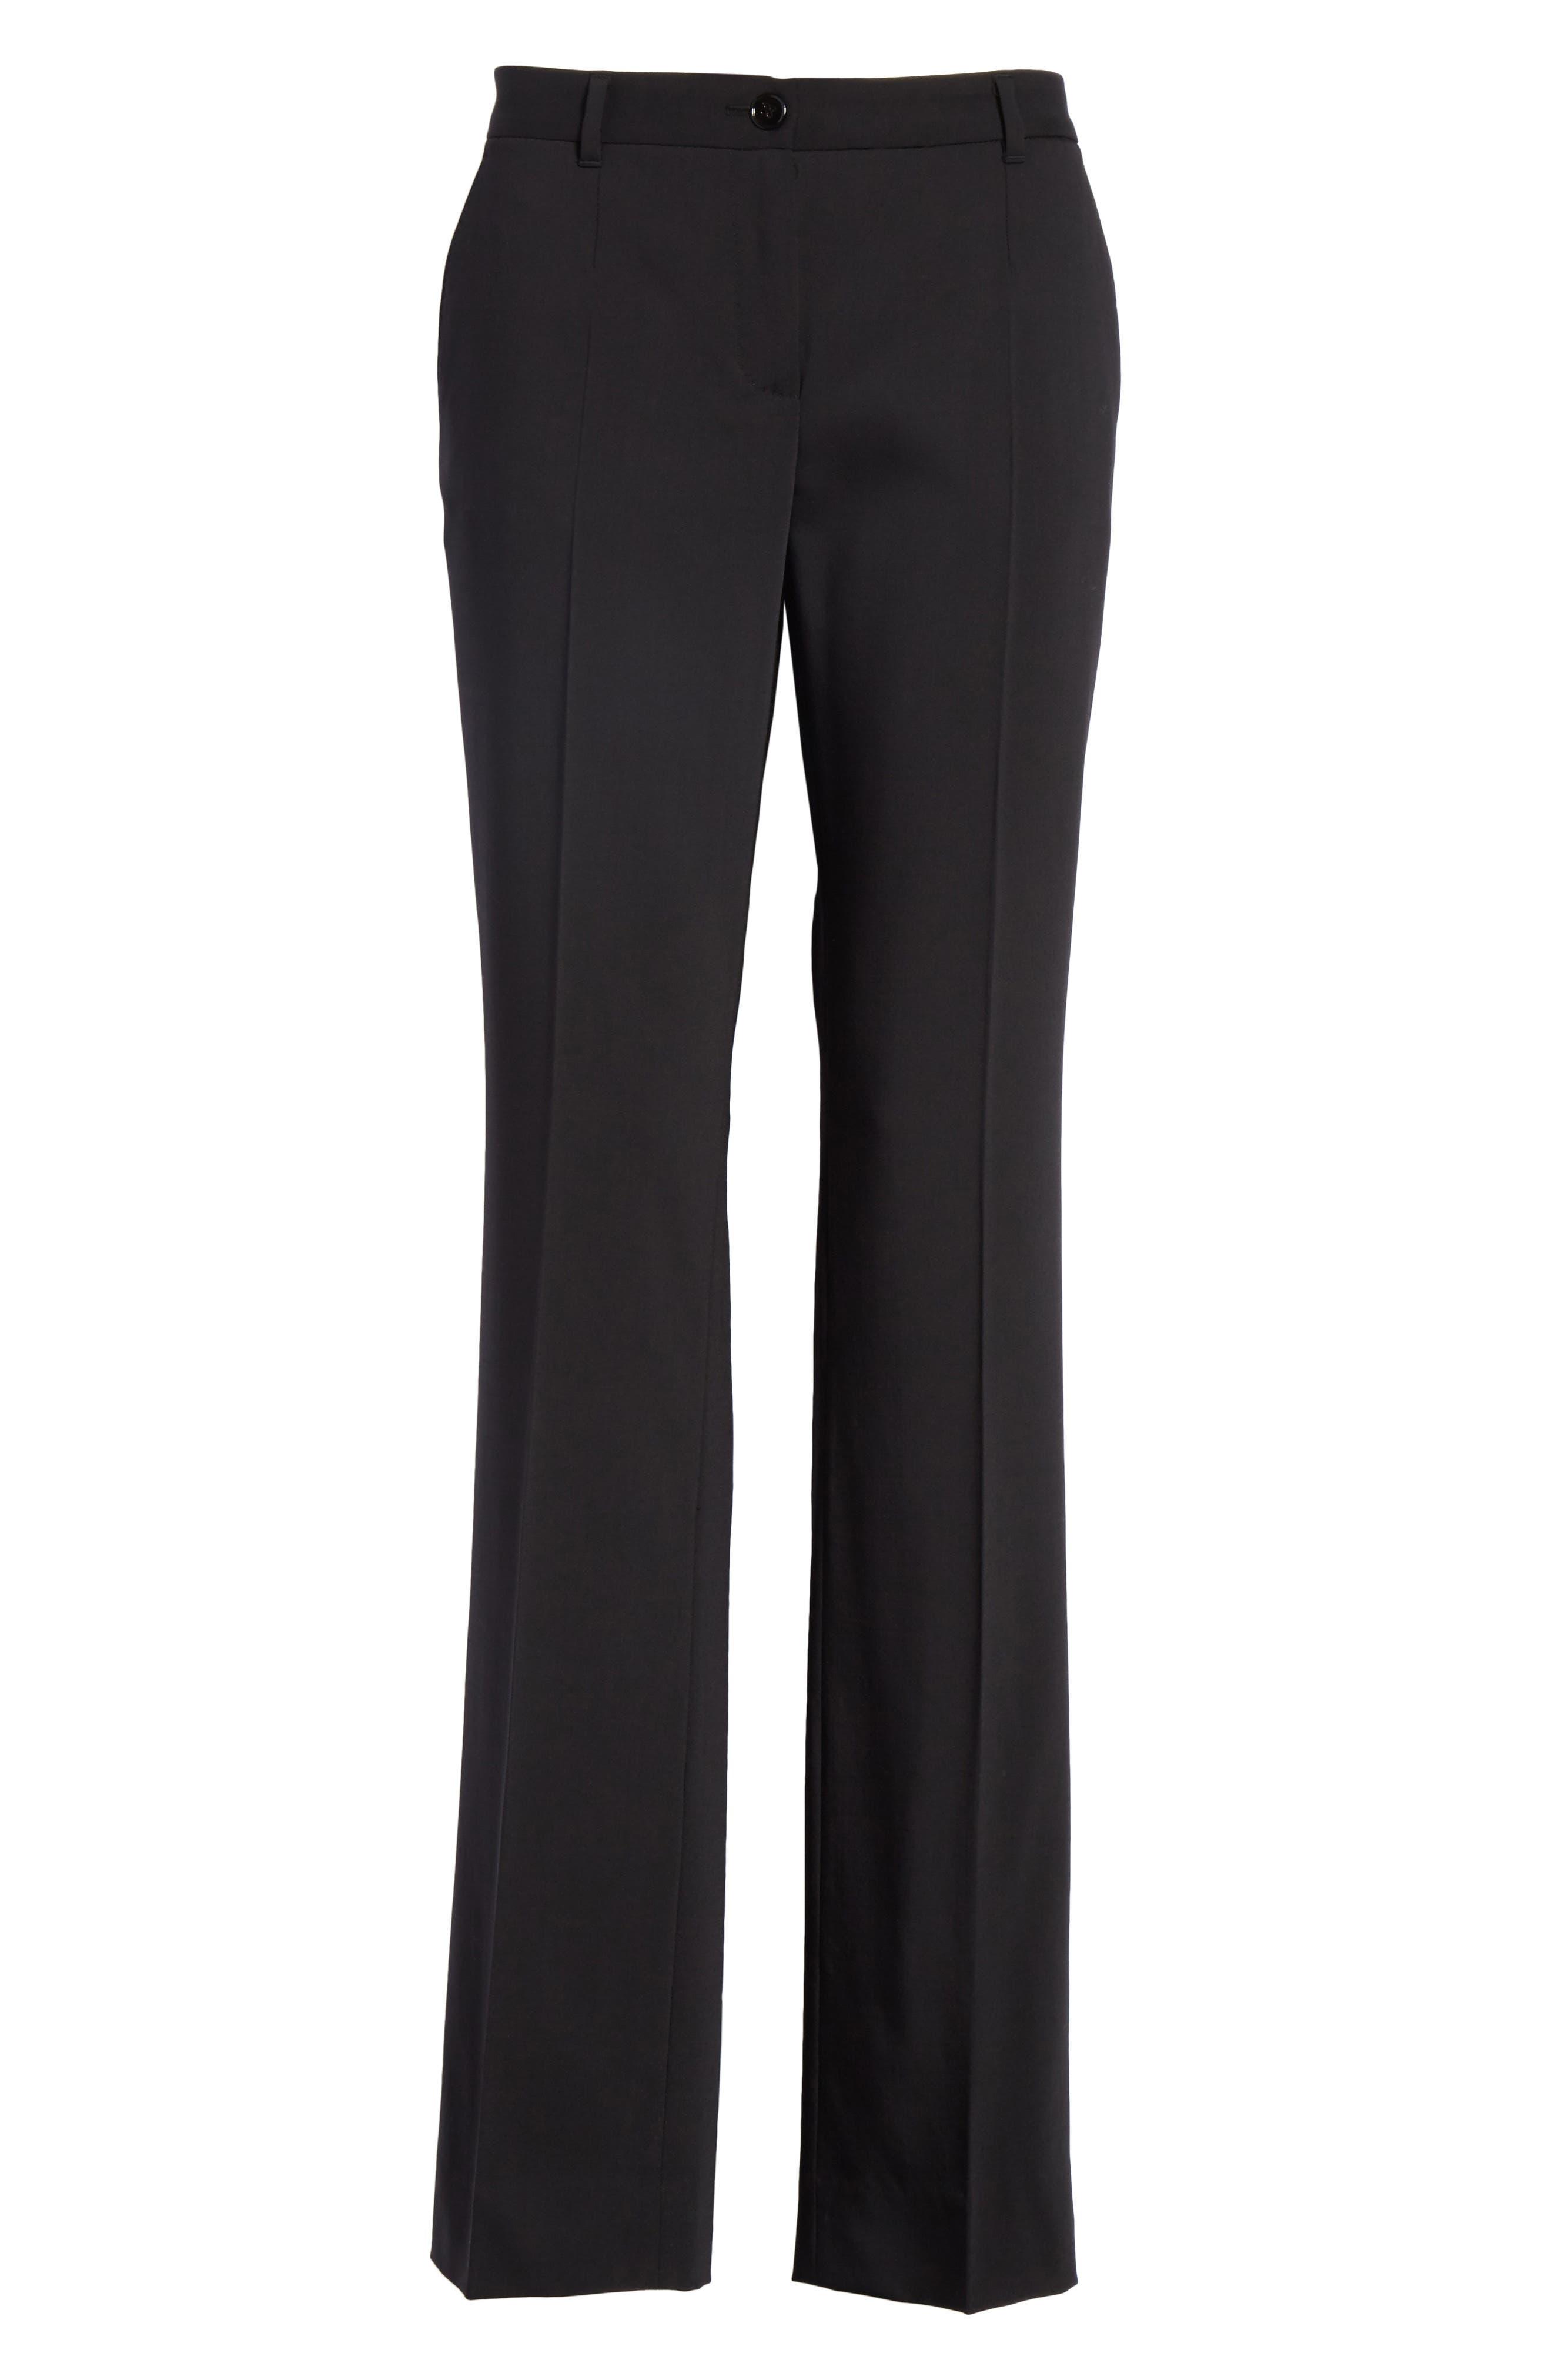 Straight Leg Stretch Wool Trousers,                             Alternate thumbnail 8, color,                             BLACK